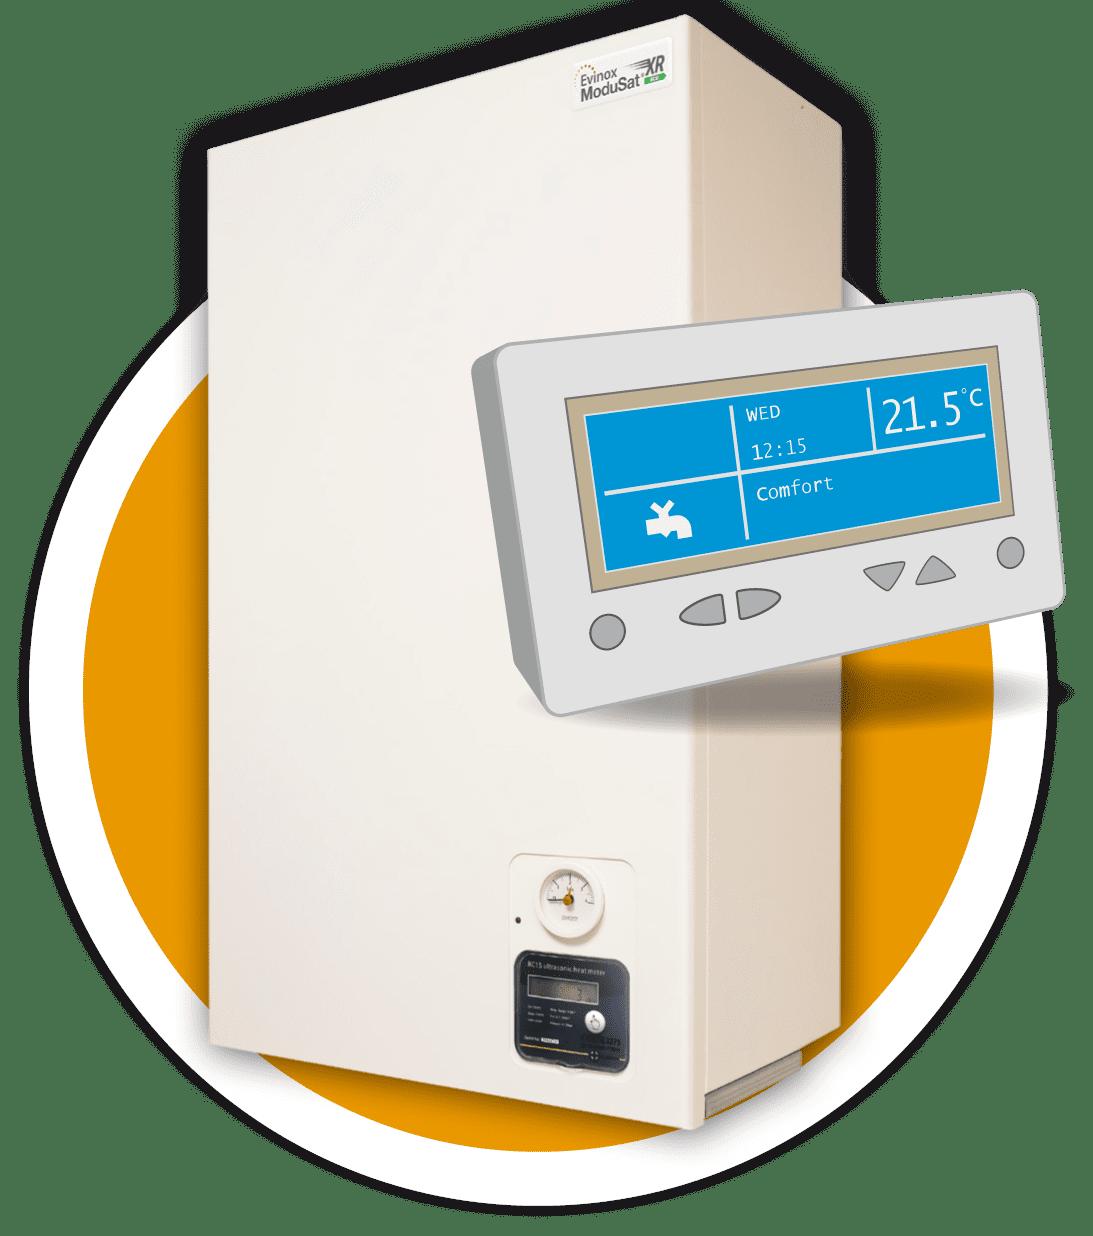 Hiu Heat Interface Units Modusat Smart Evinox Energy Recovery Furnace Wiring Diagram Unit Icon